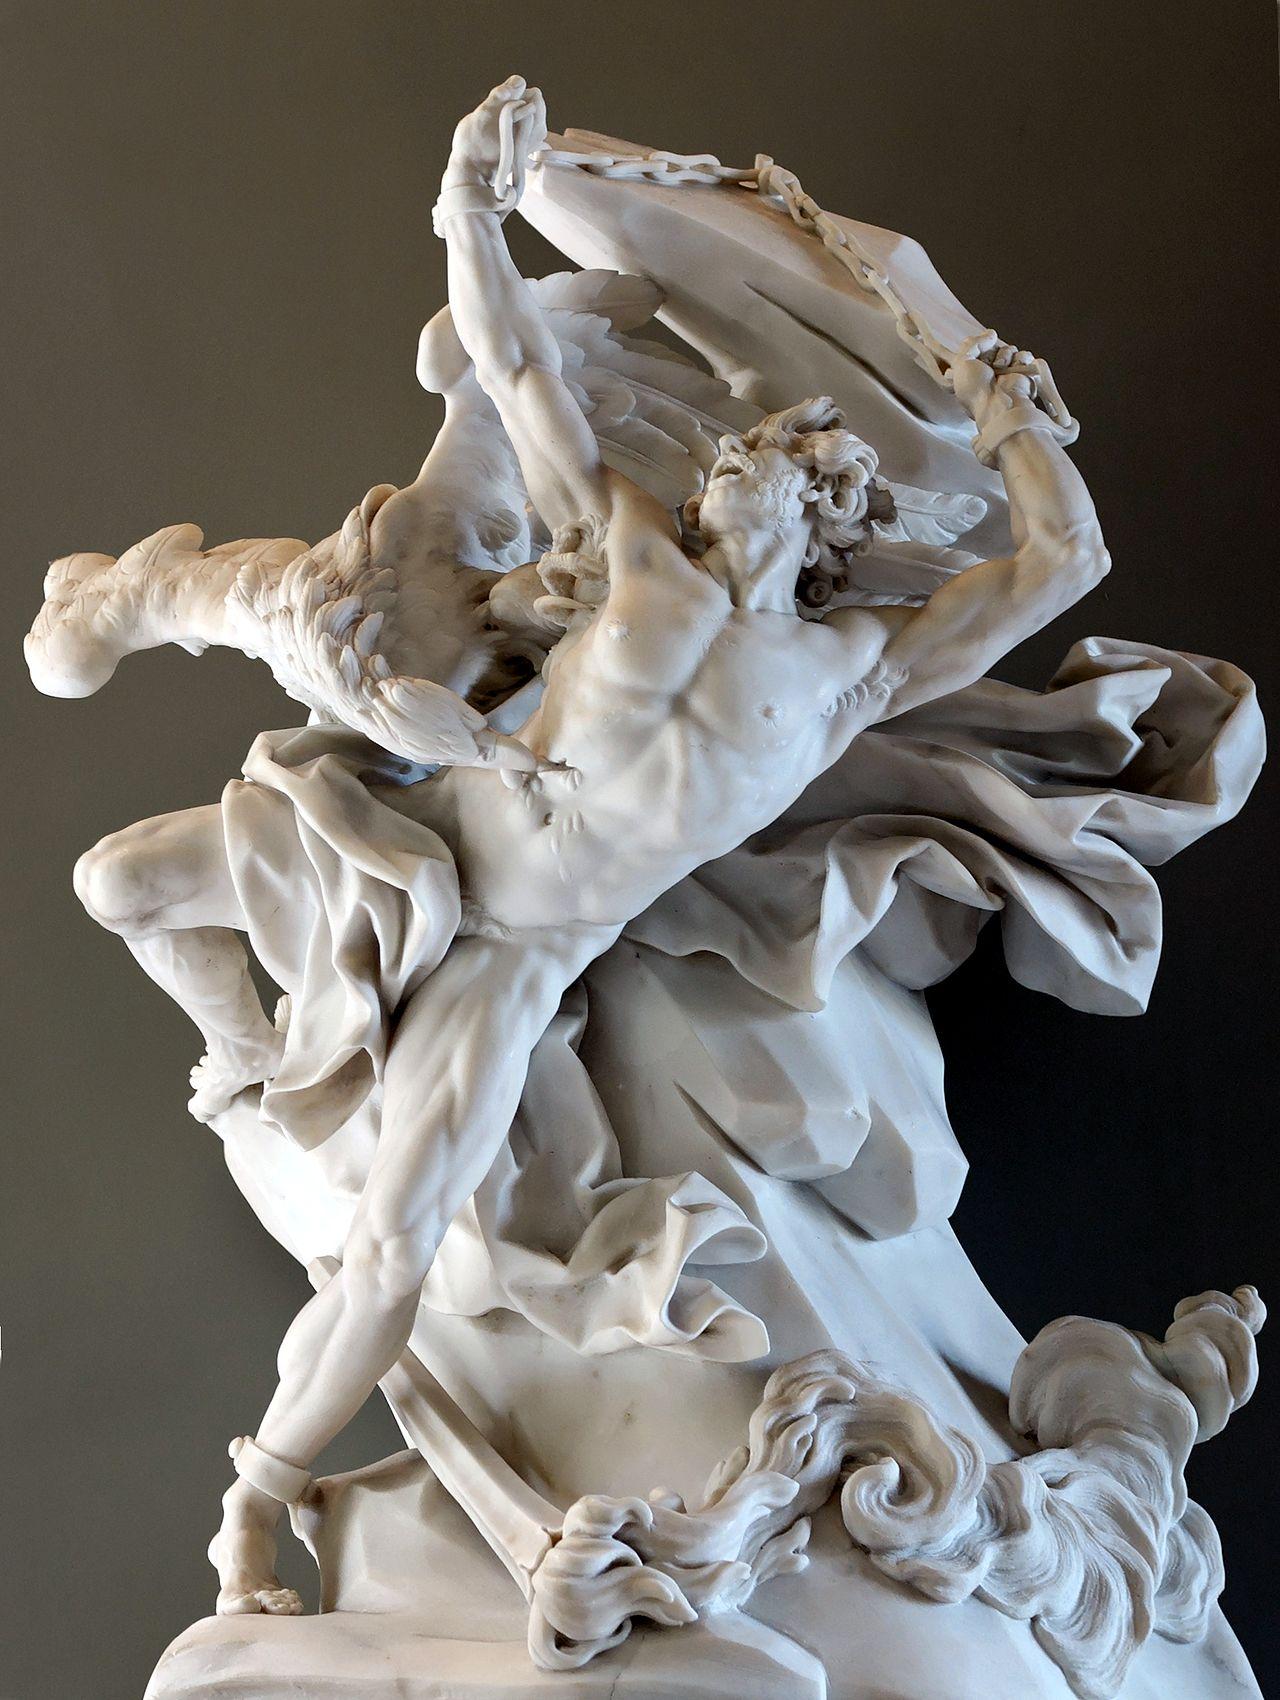 Prometheus depicted in a sculpture by Nicolas-Sébastien Adam, 1762 (Louvre)